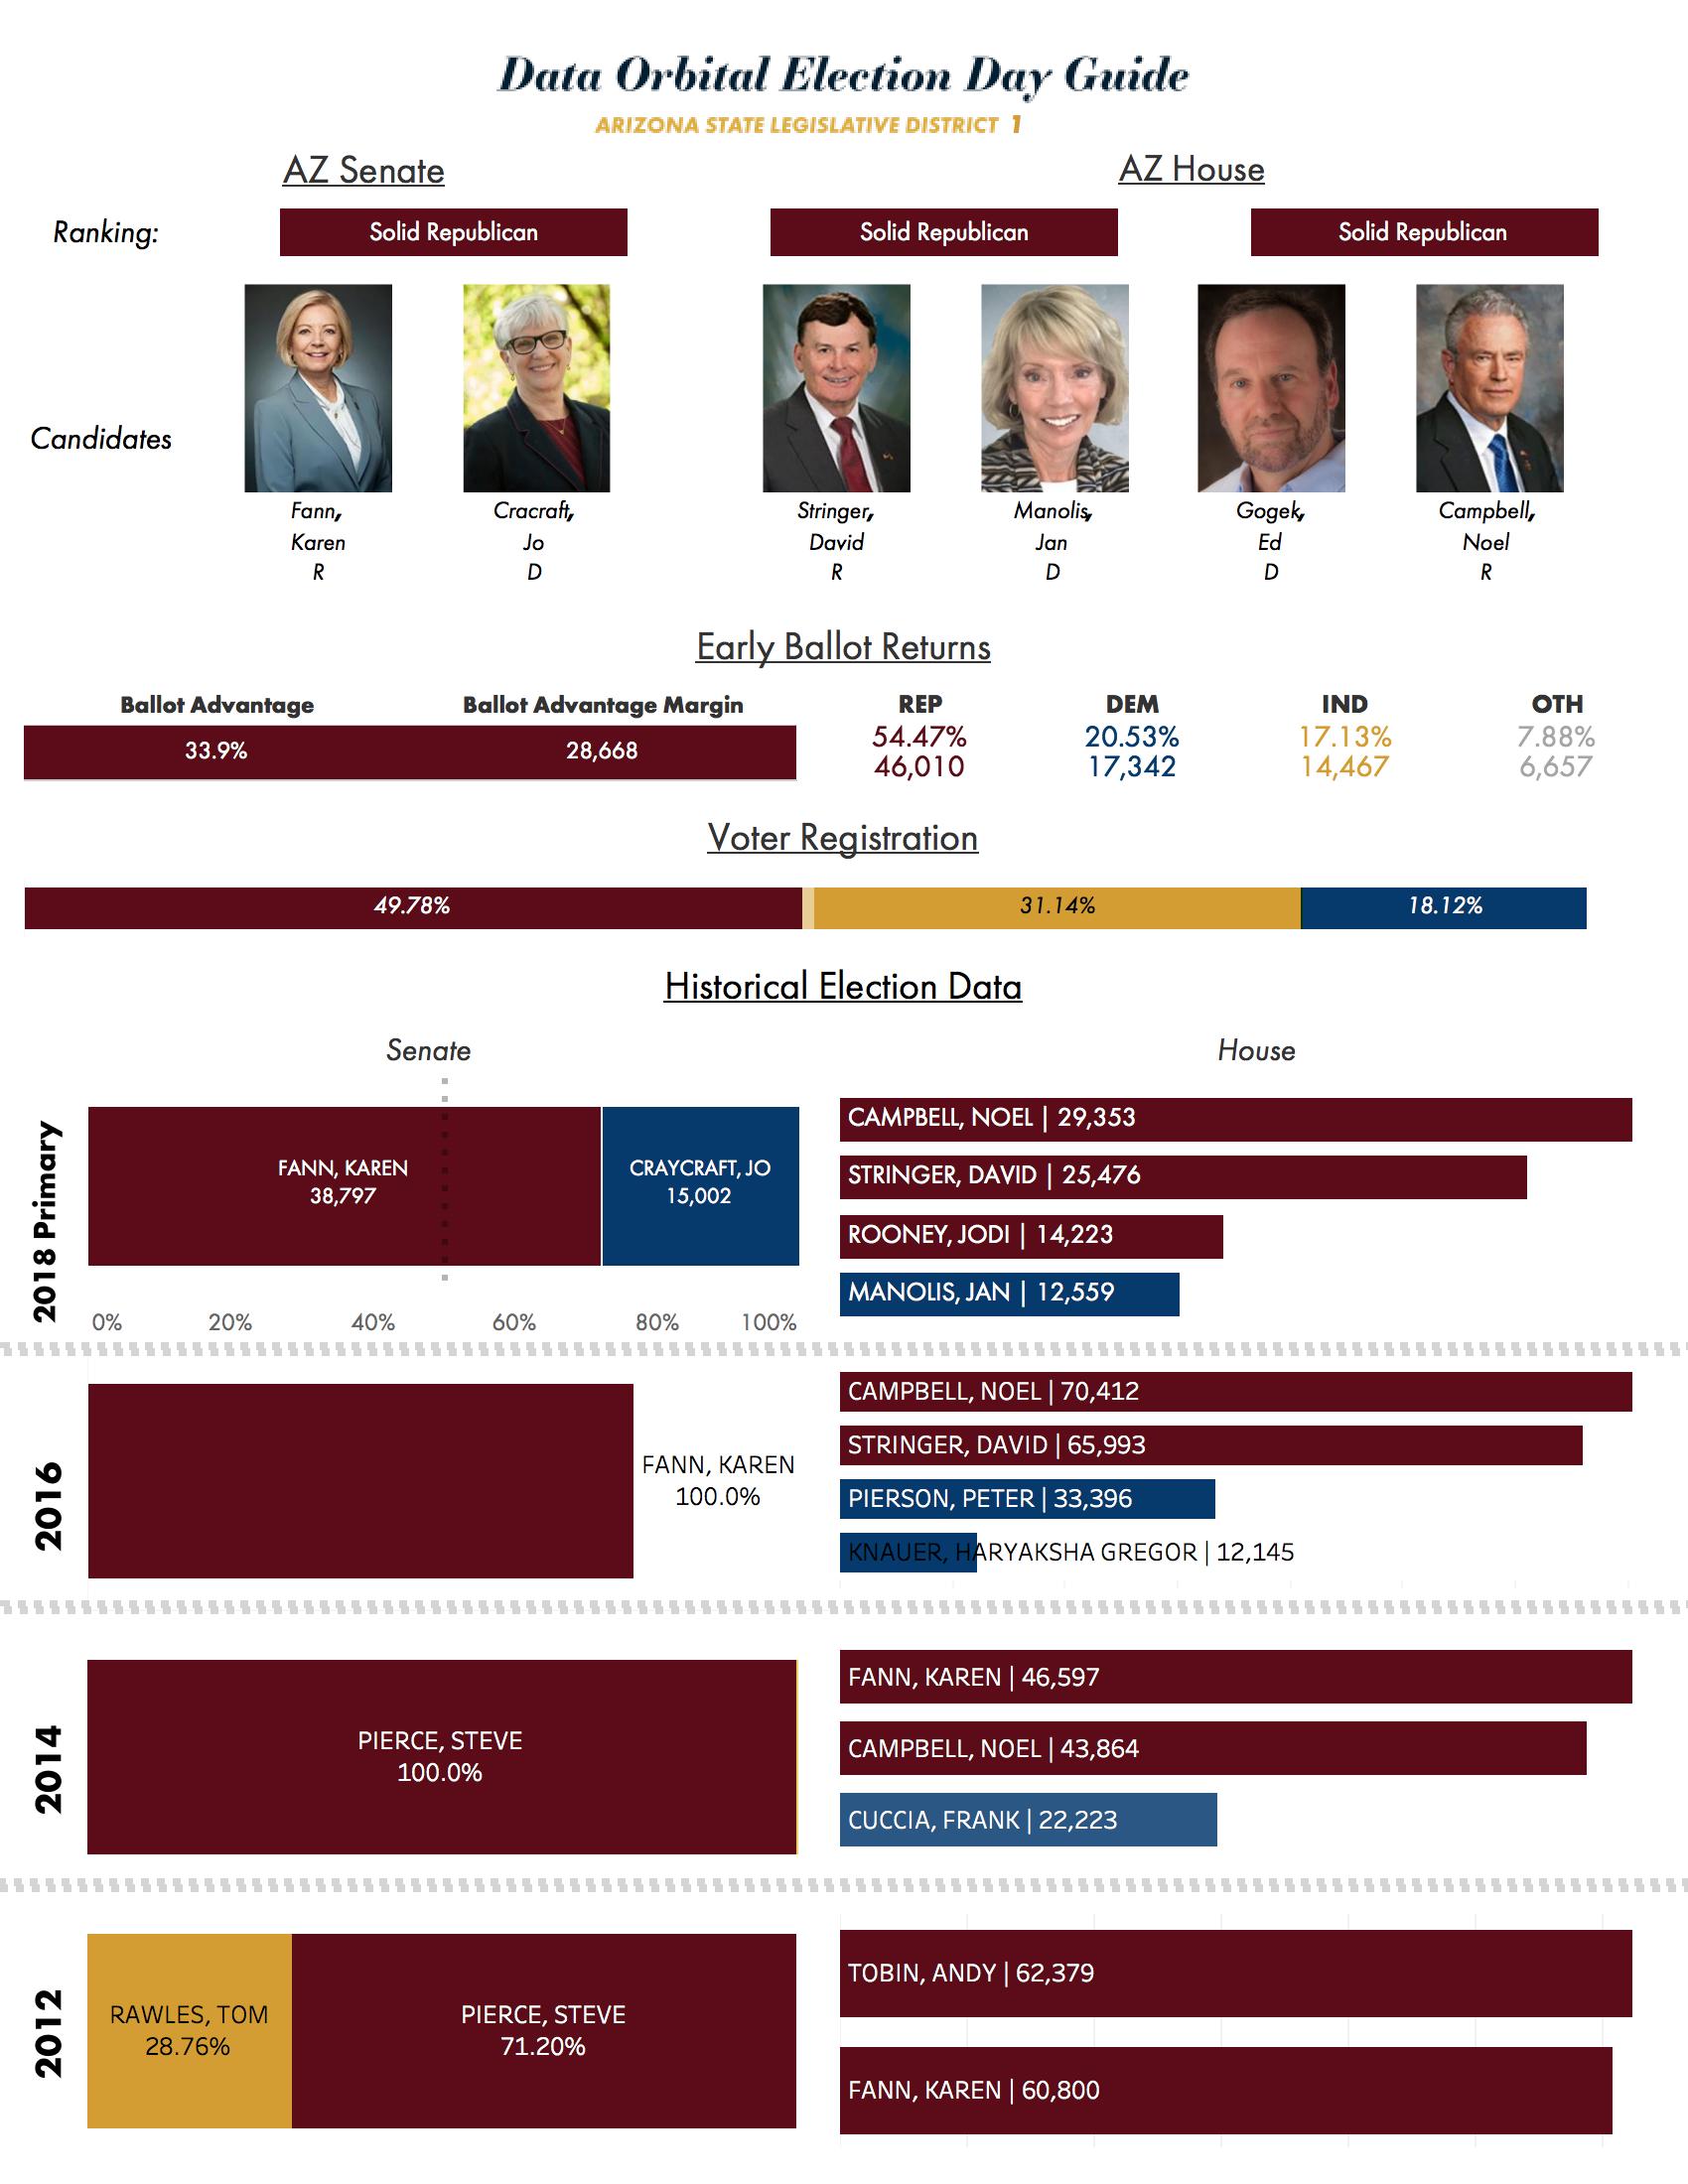 2018 Data Orbital Arizona Legislative District Election Day Guide